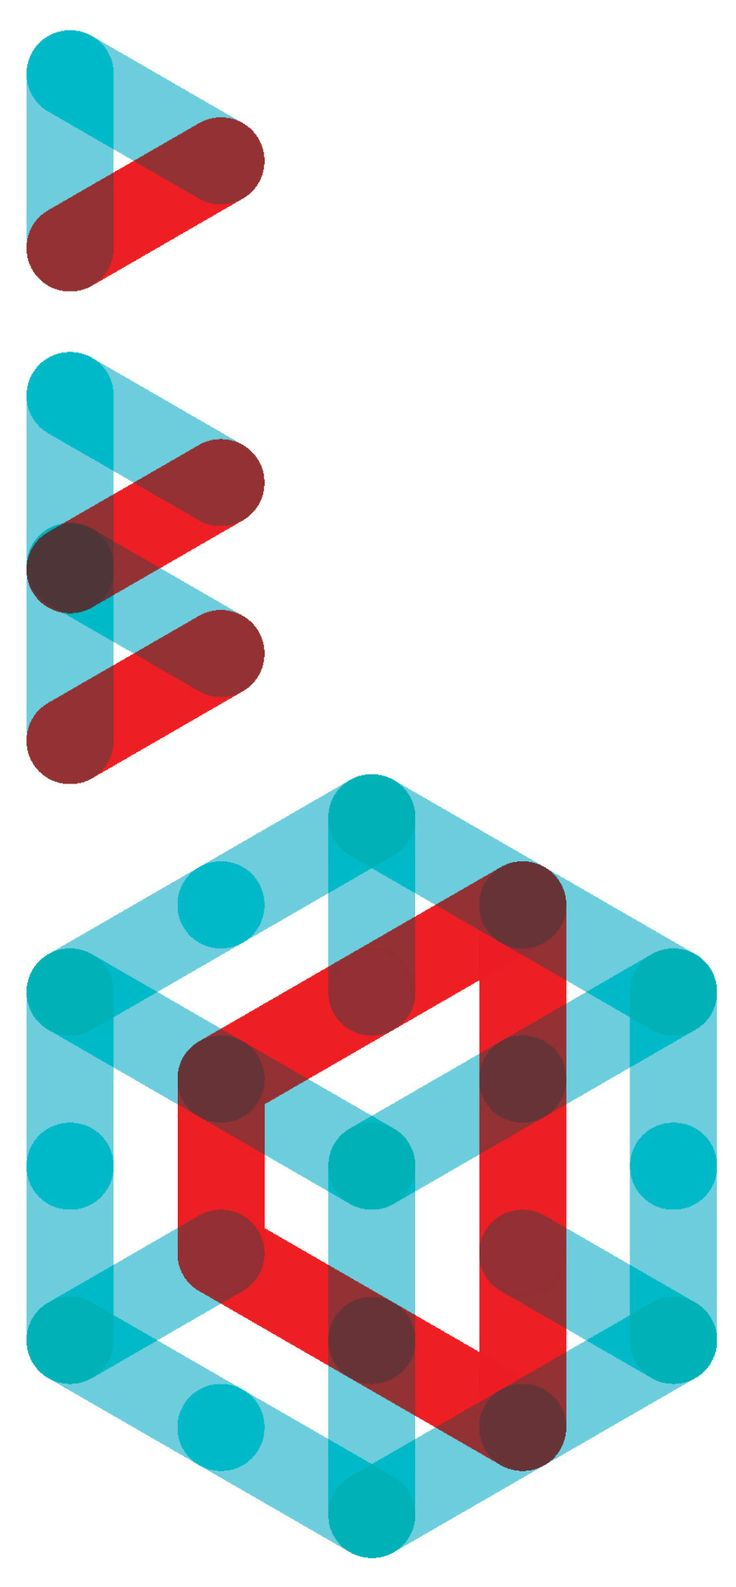 iindex - 31 May 2015